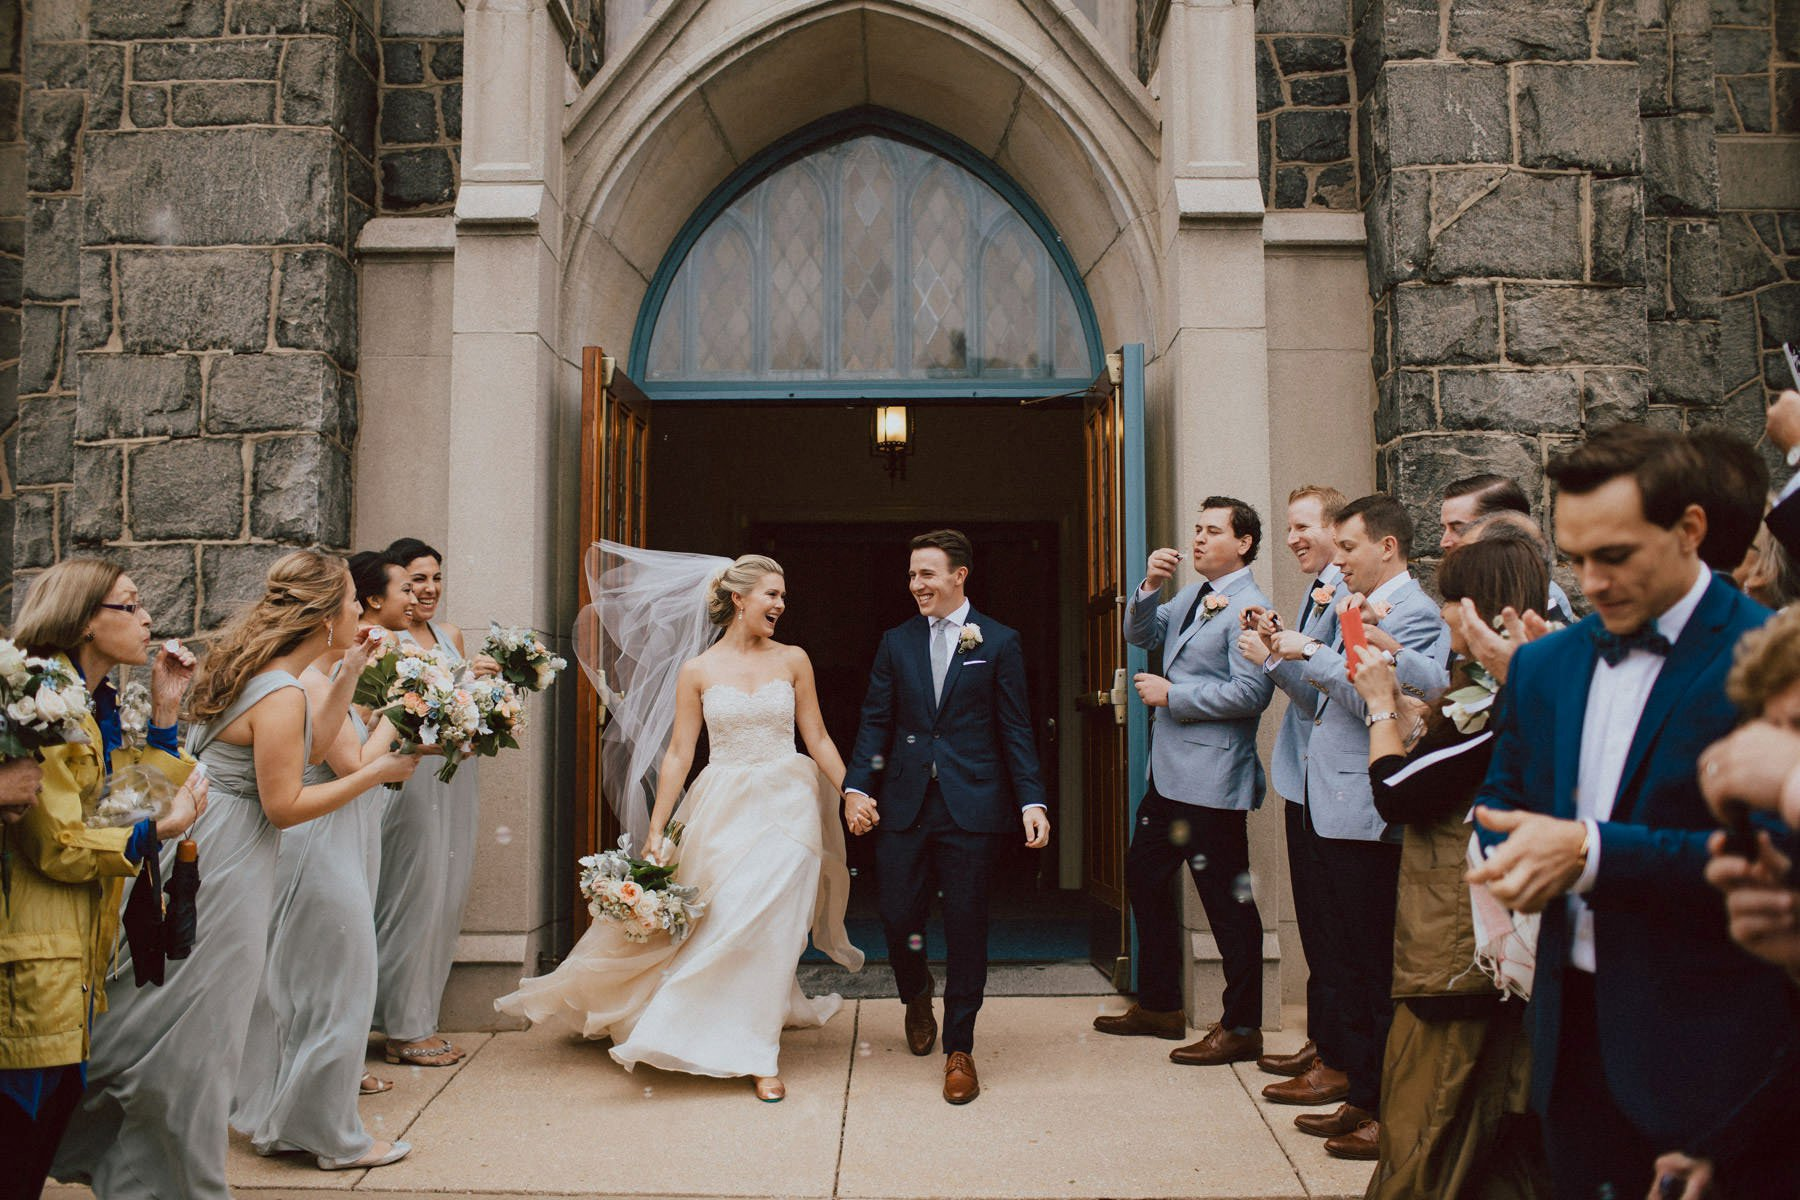 greenville-country-club-wedding-59.jpg